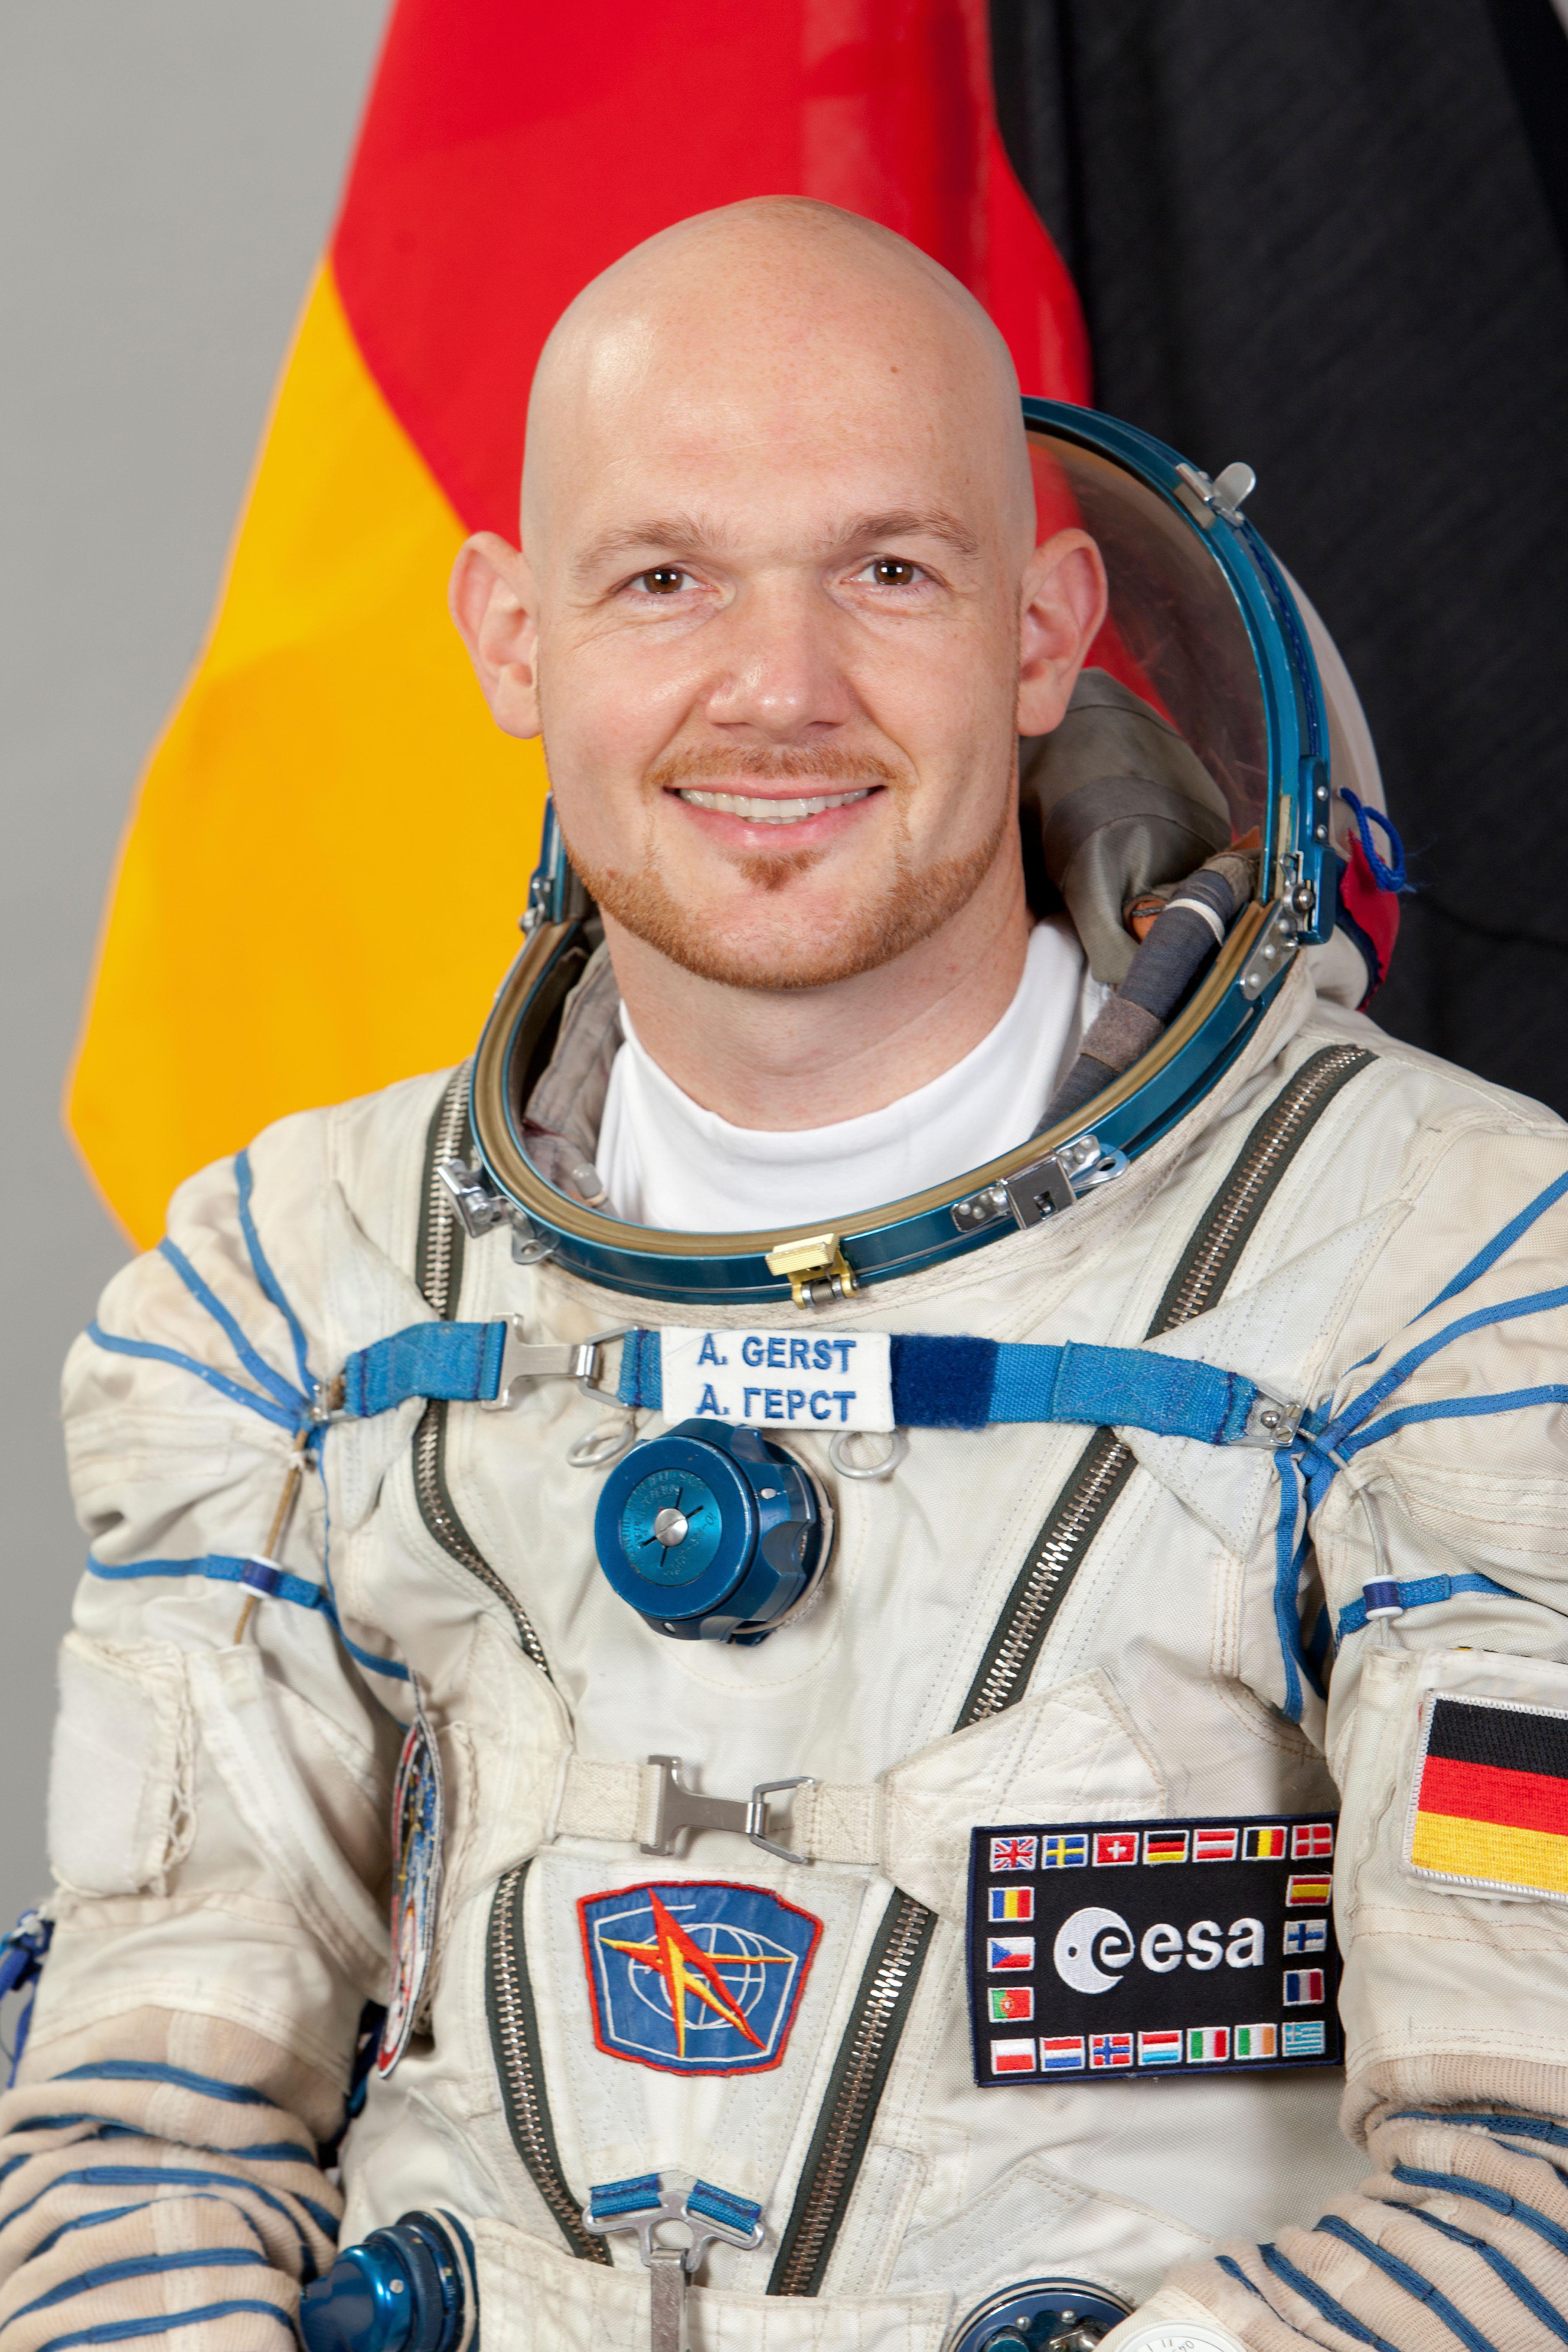 European Space Agency Astronaut Alexander Gerst